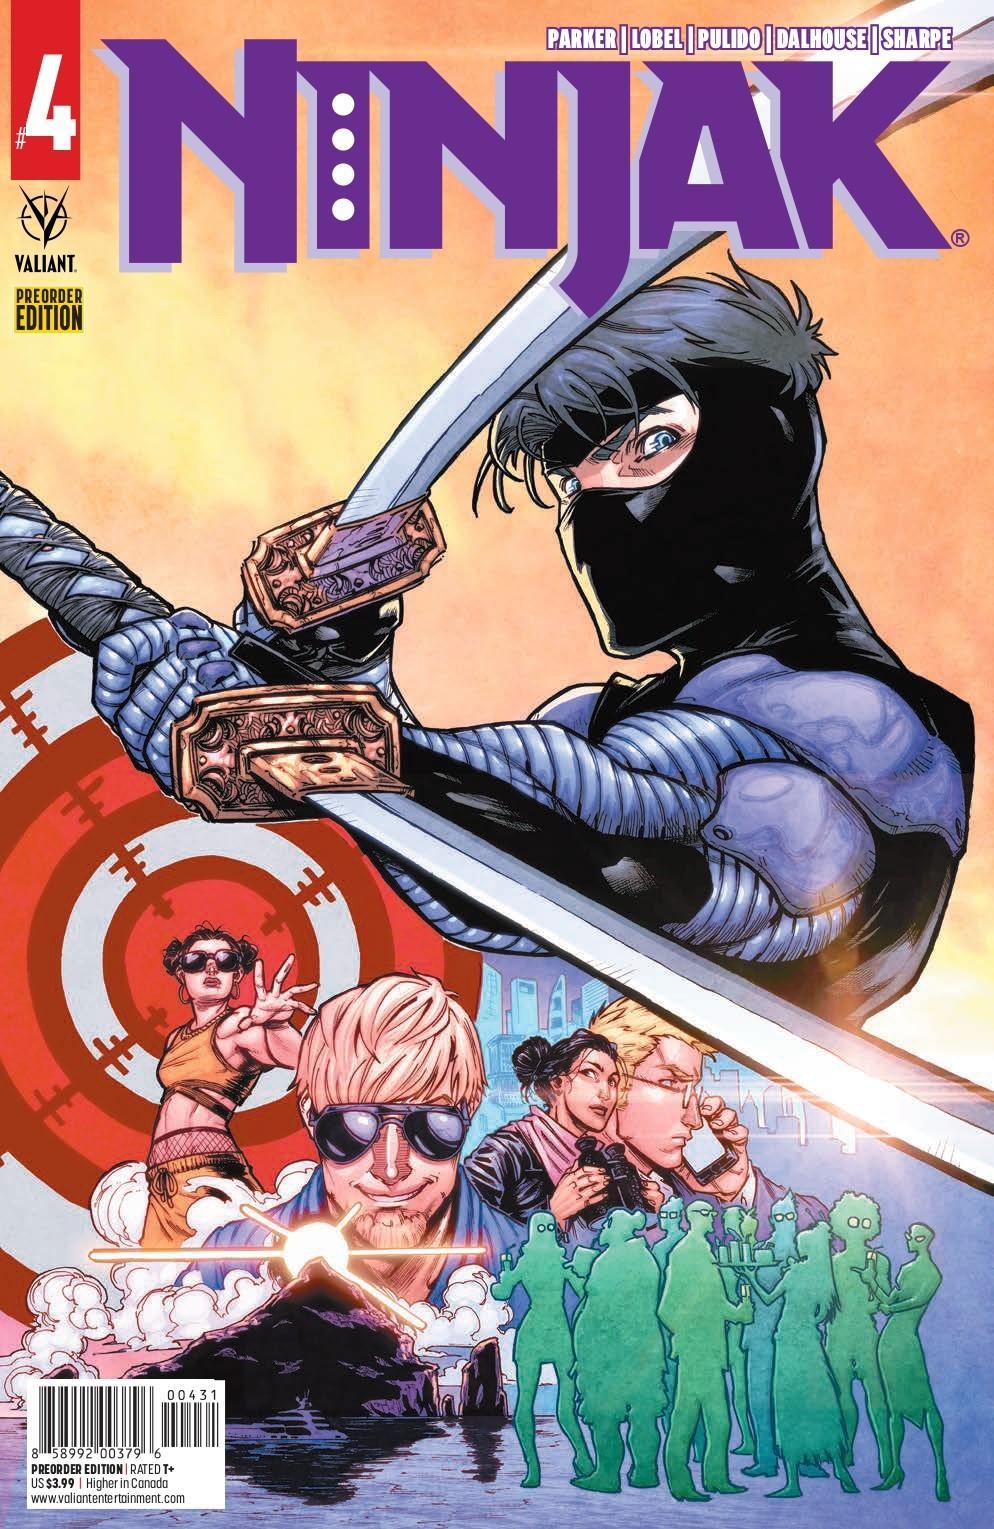 NINJAK_04_PREORDER_COVER ComicList Previews: NINJAK #4